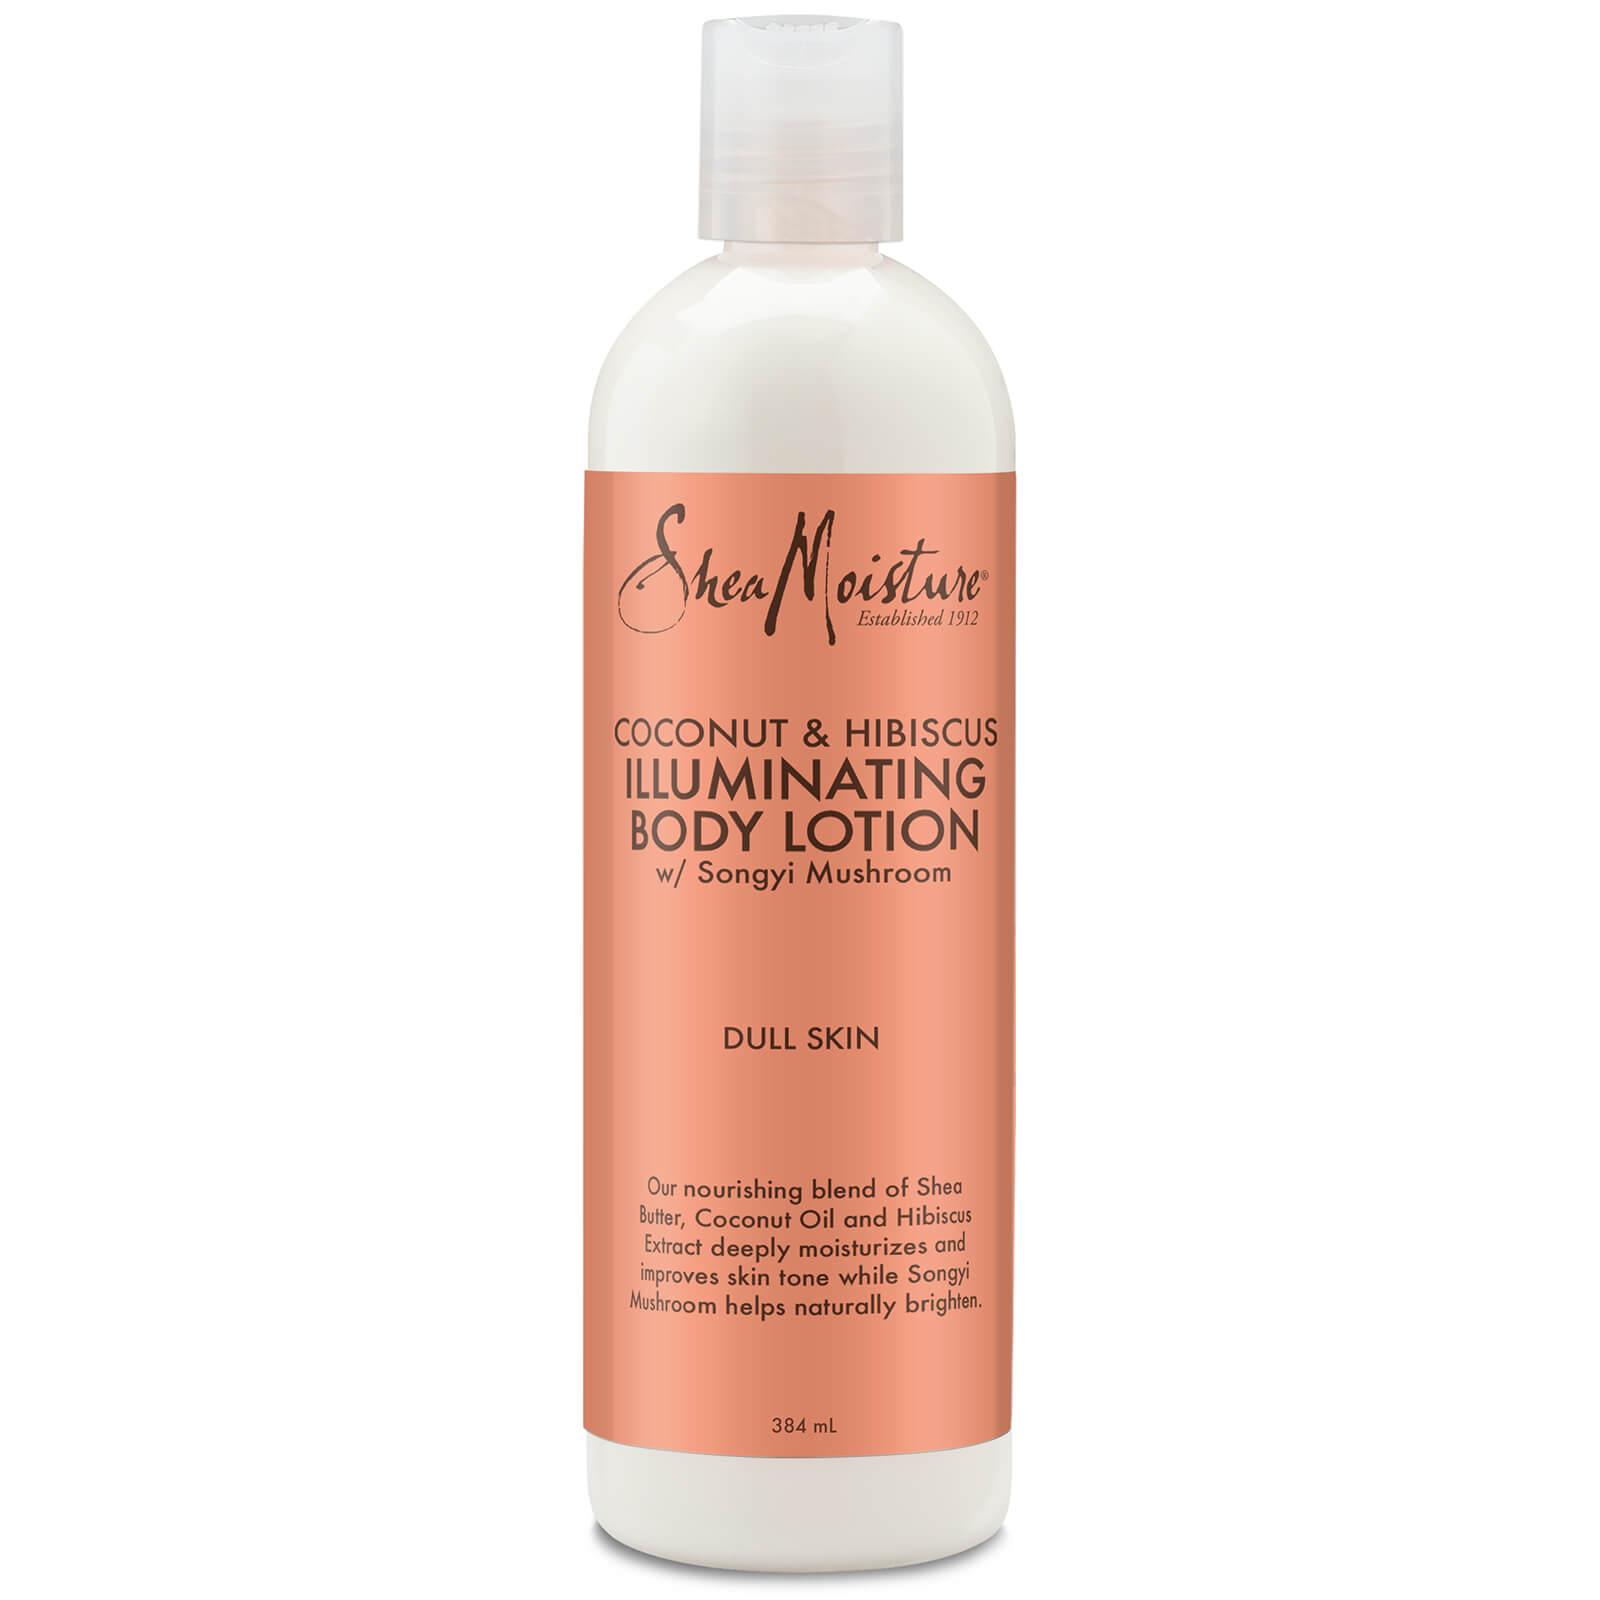 shea moisture coconut & hibiscus illuminating body lotion 384ml